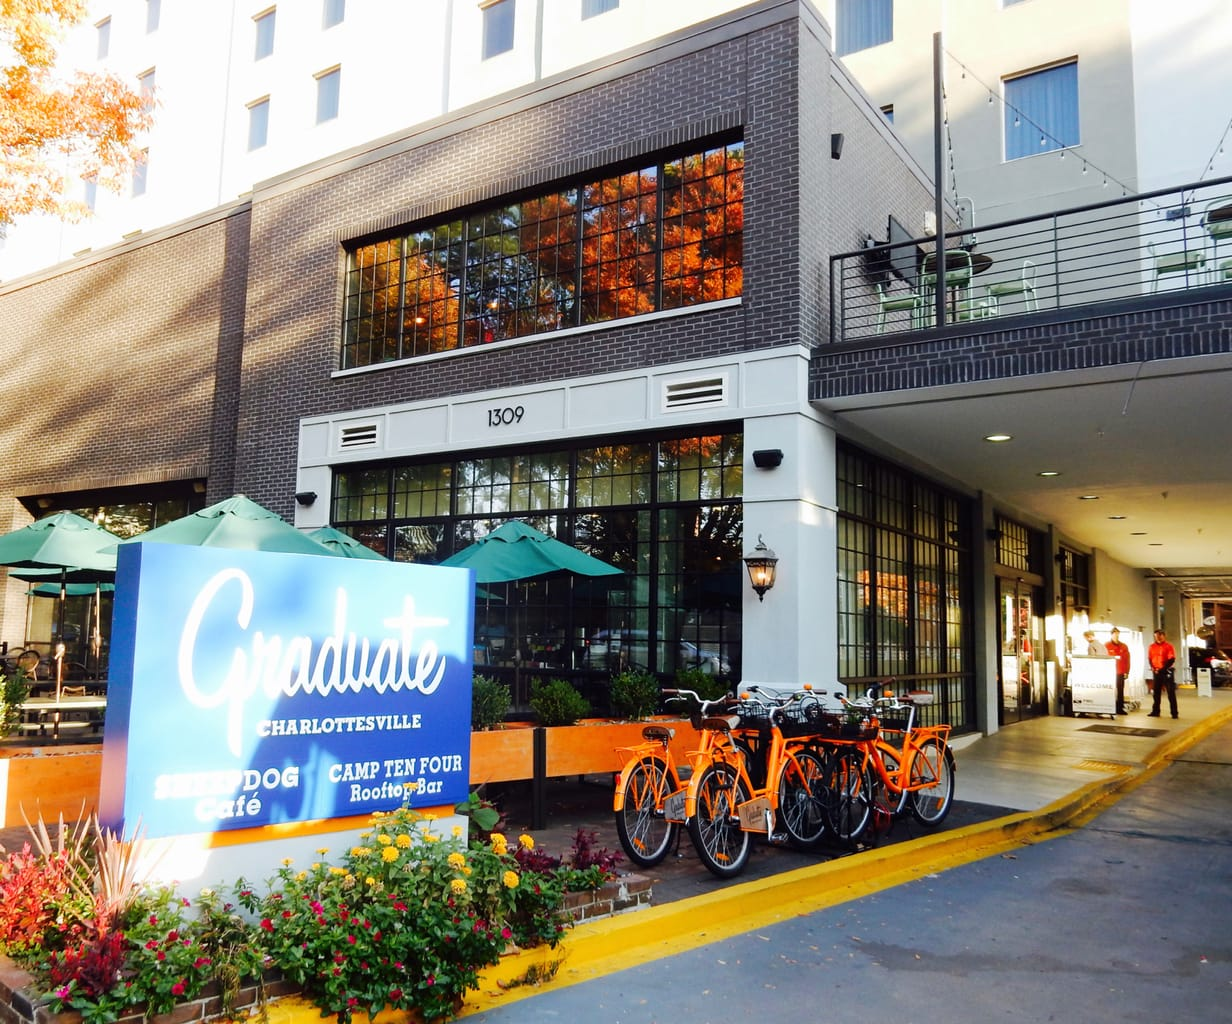 Graduate Hotel Charlottesville VA